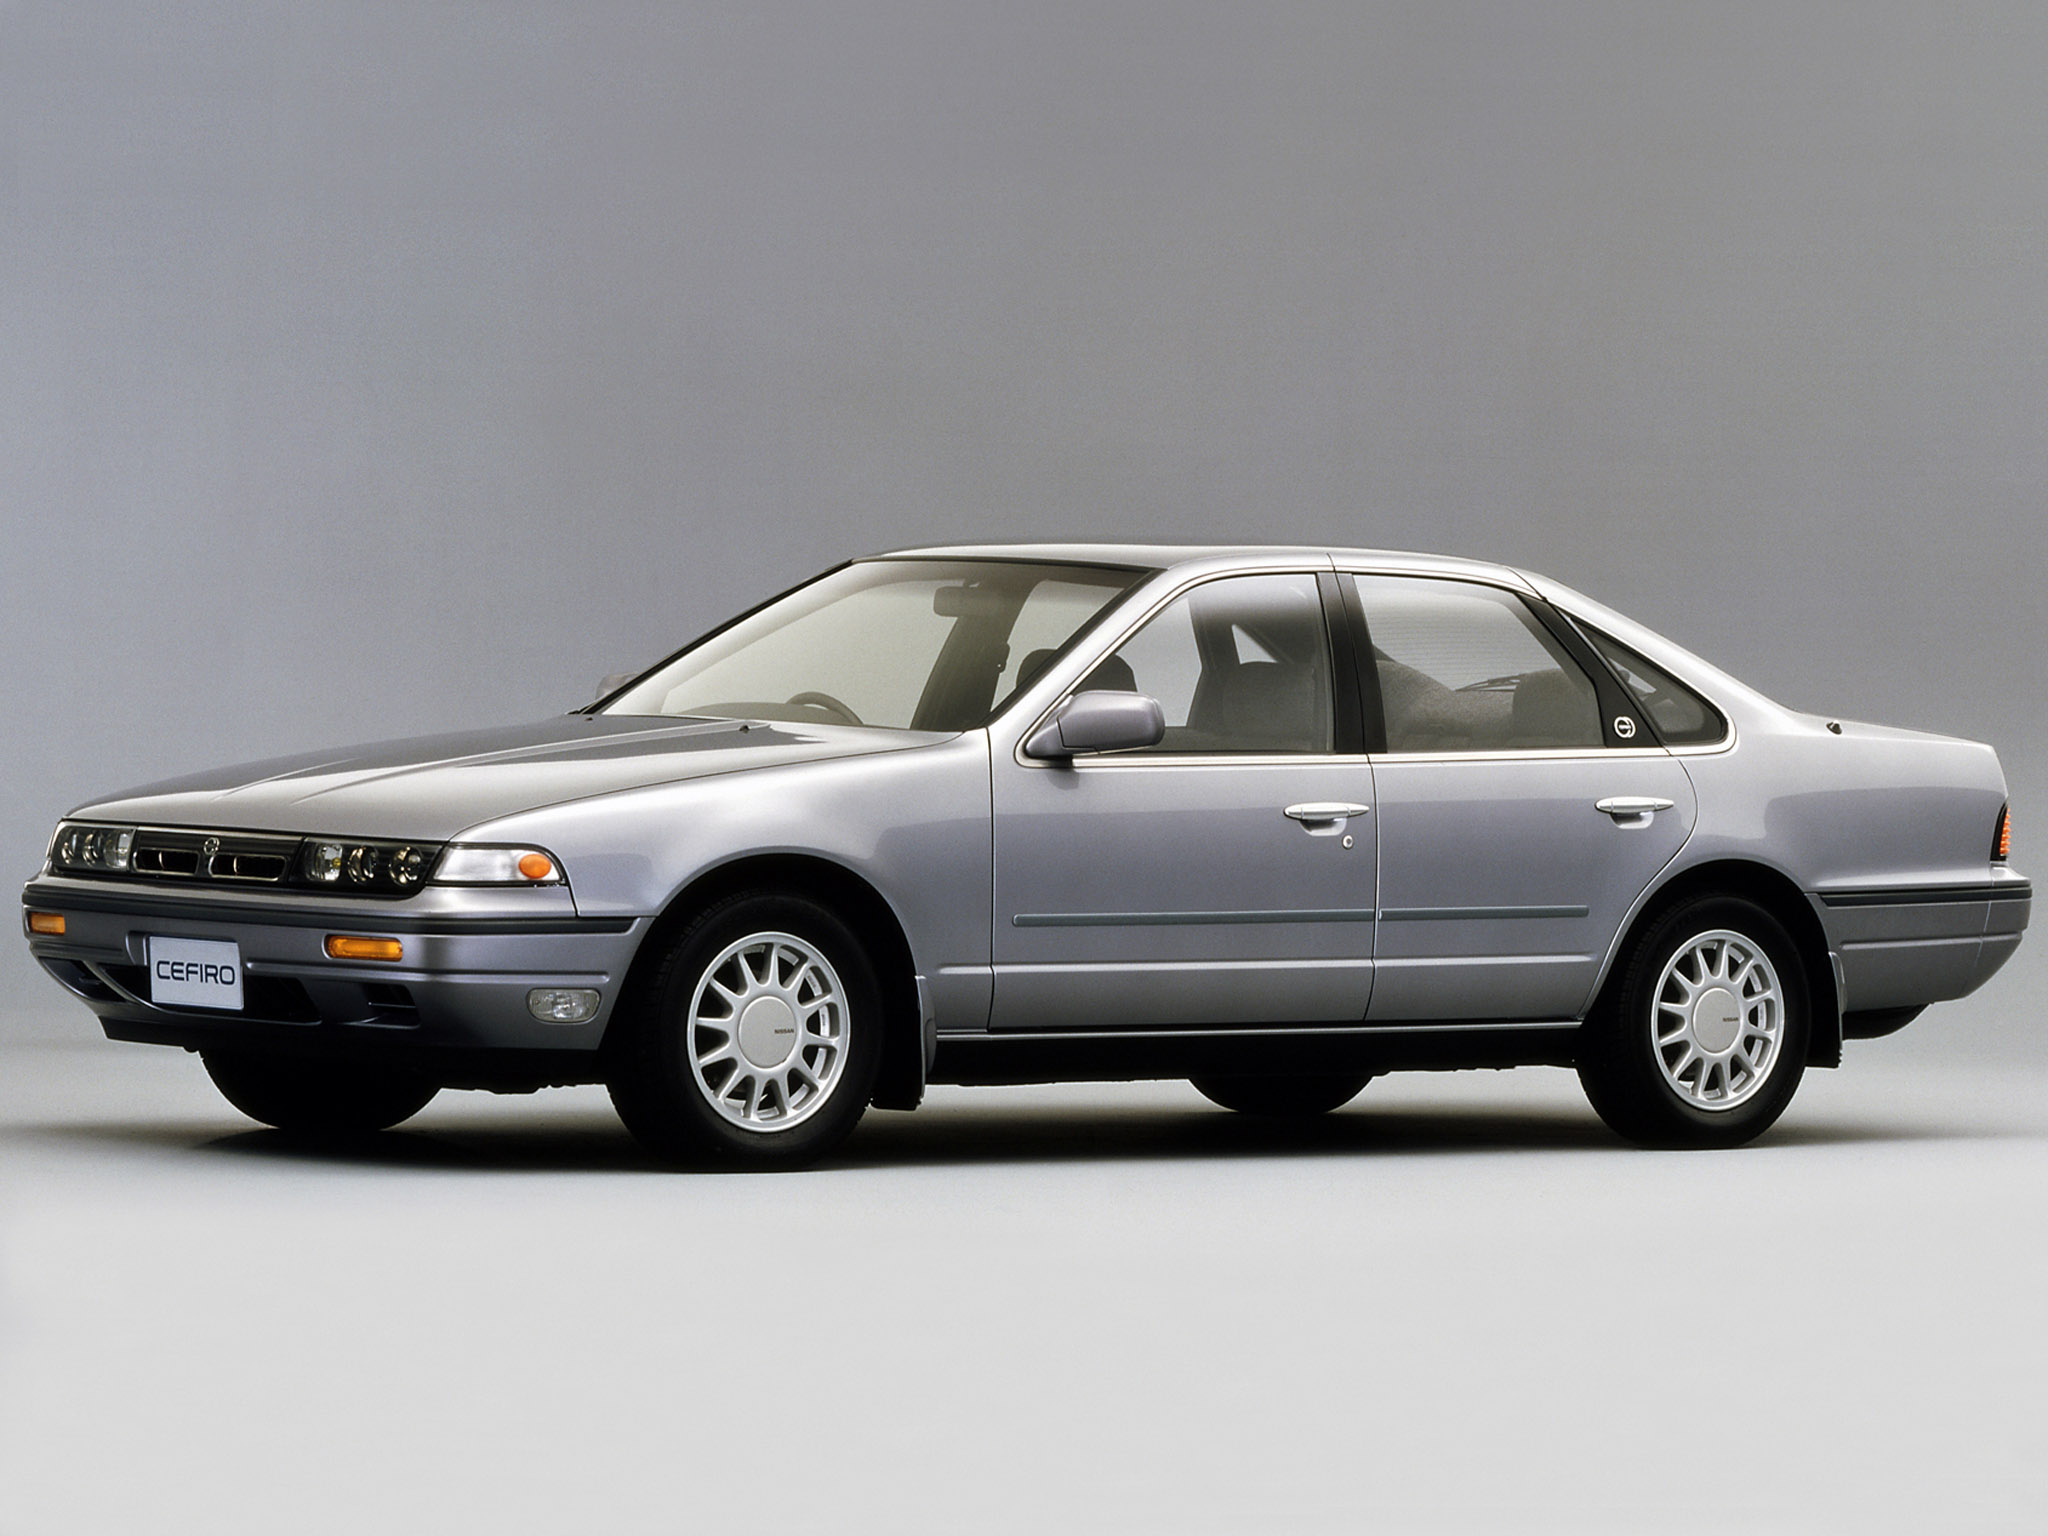 Nissan Cefiro I (A31) 1988 - 1994 Sedan #4